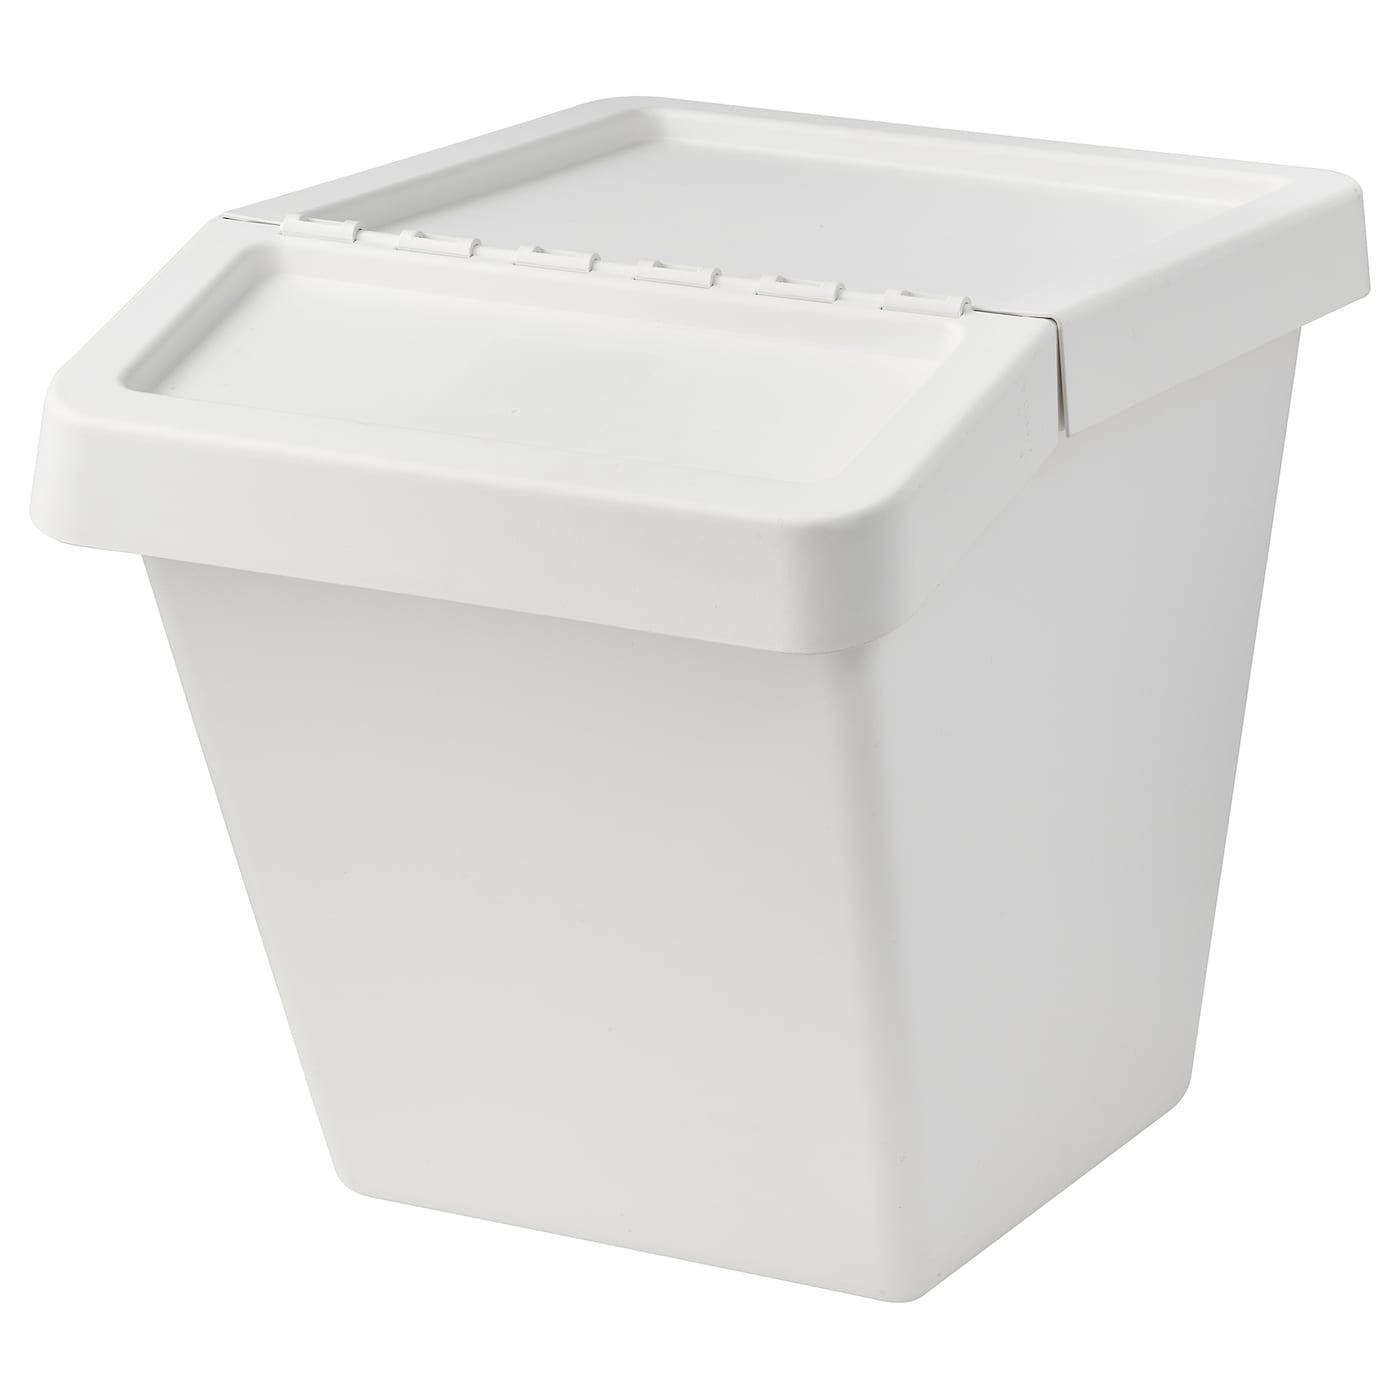 SORTERA Recycling bin with lid - white 8 gallon